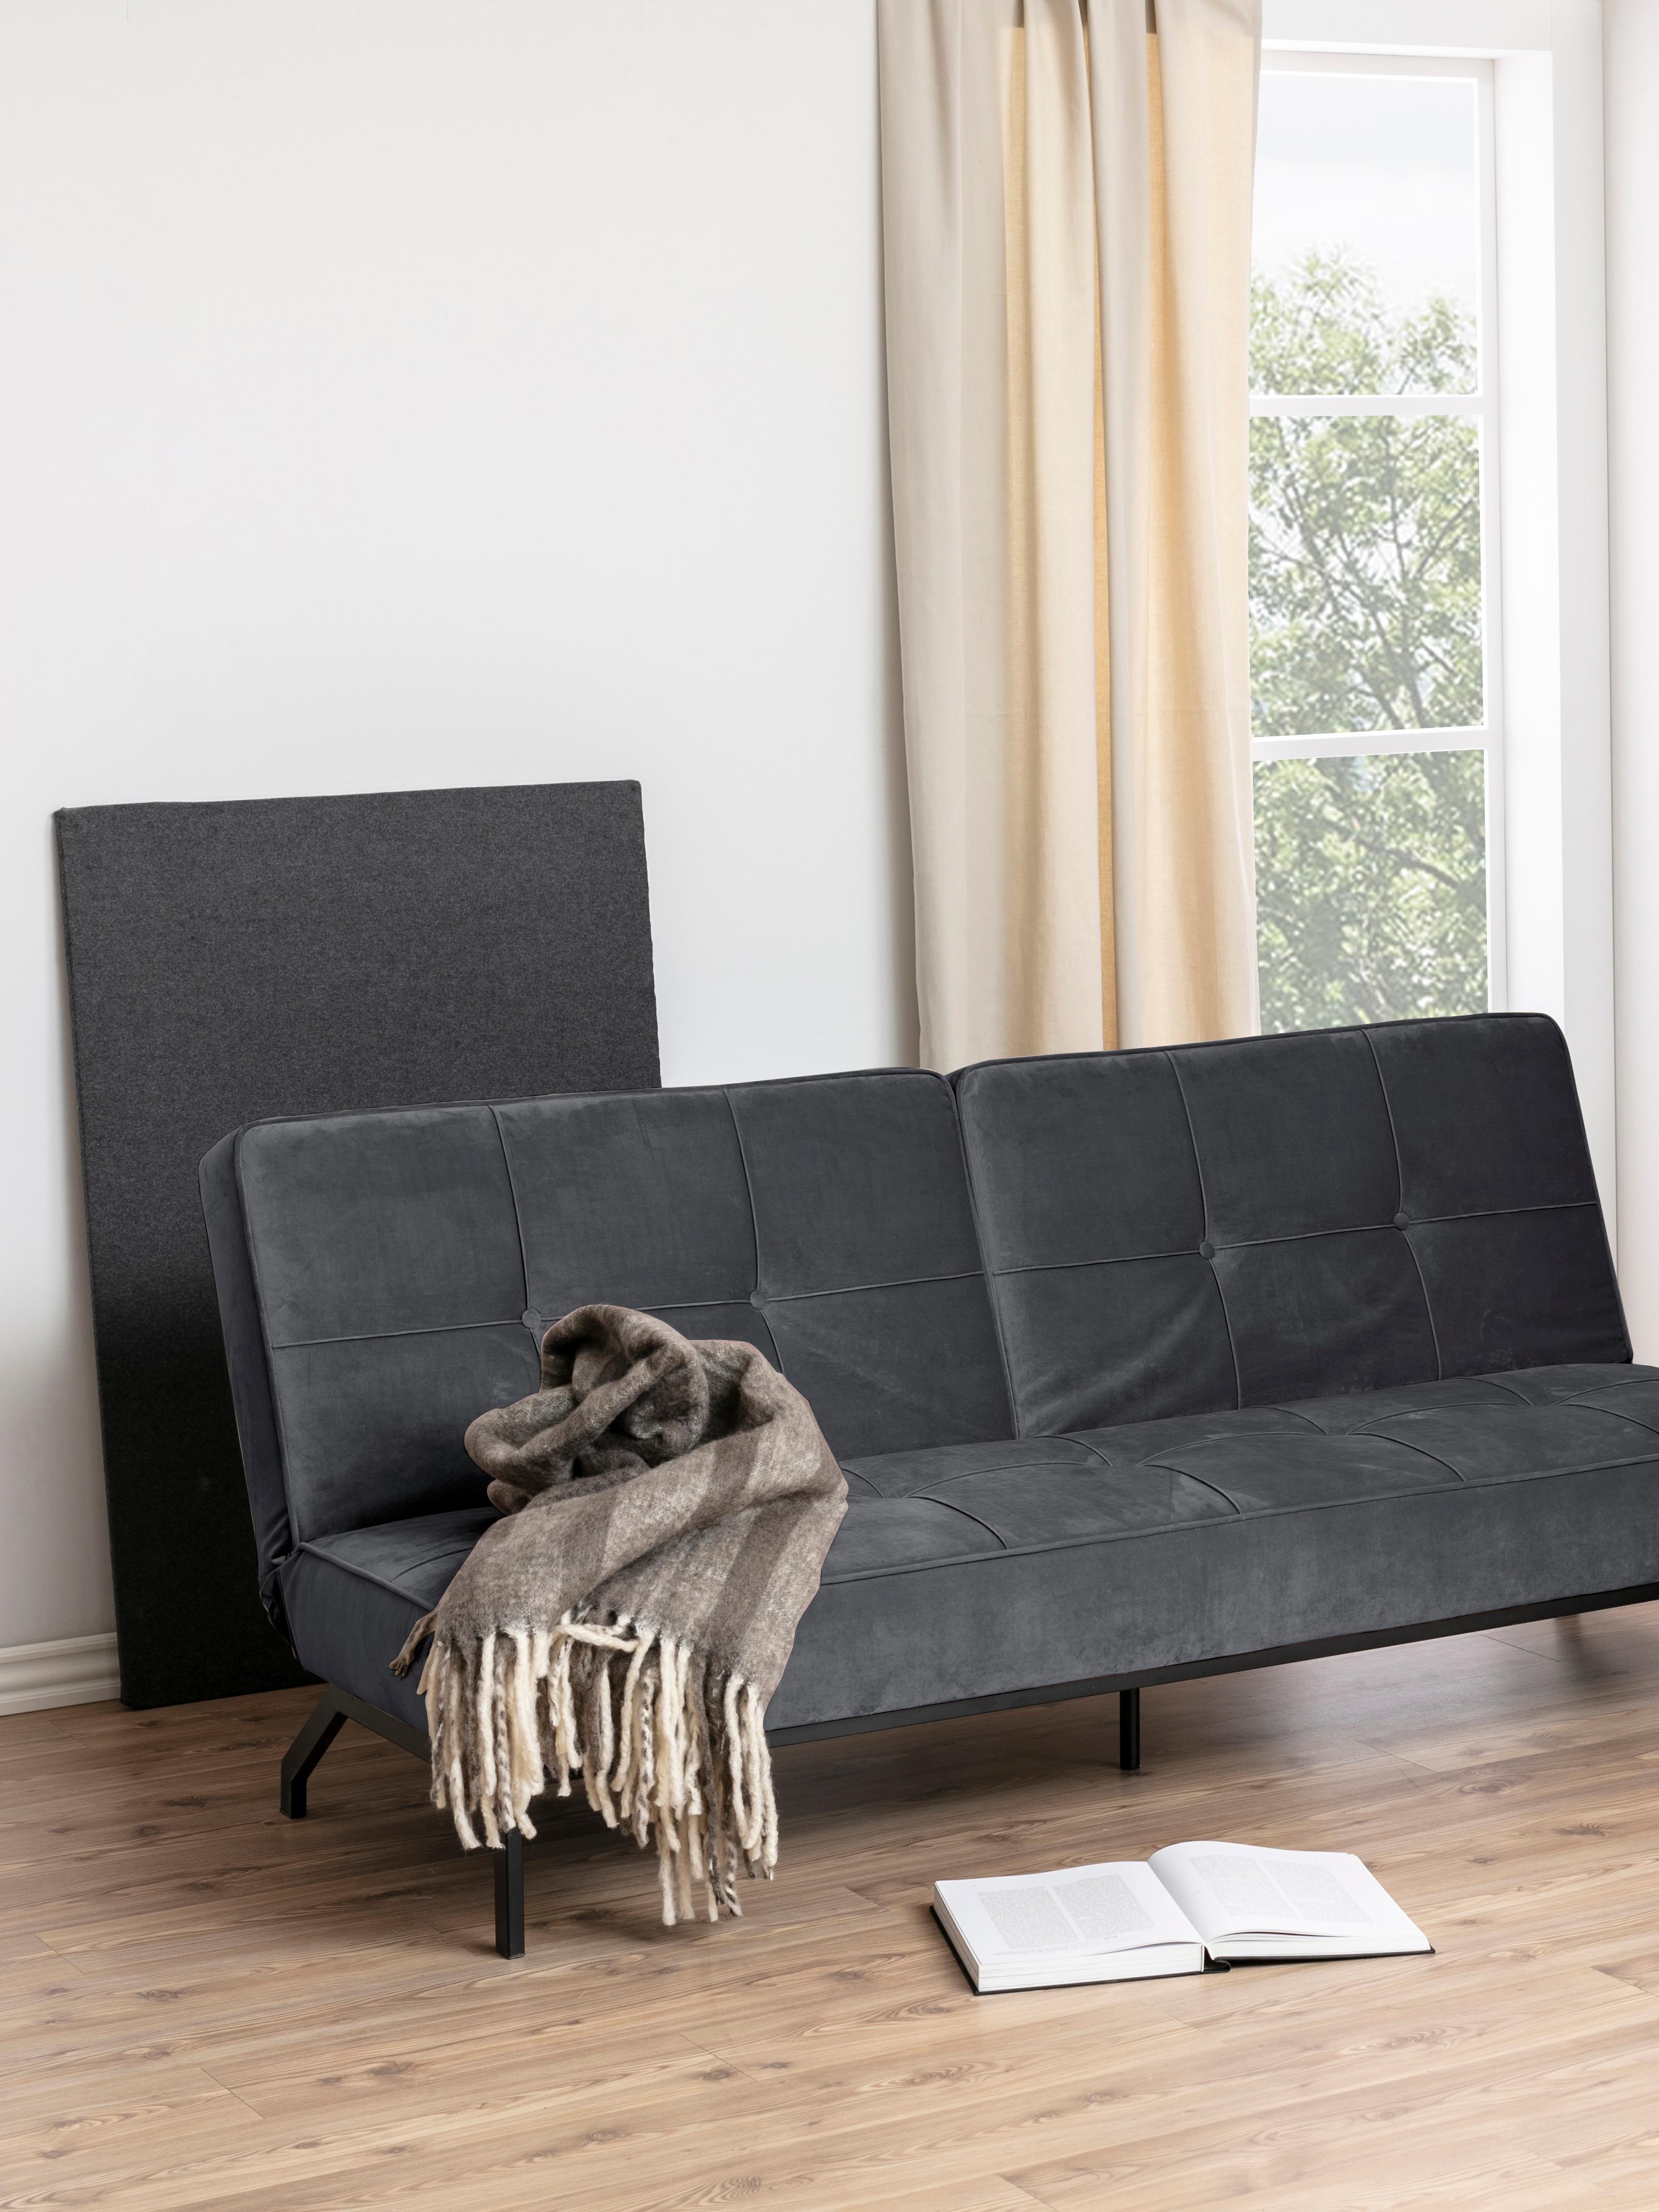 Samt-Schlafsofa Perugia in Dunkelgrau, Bezug: Polyester Der hochwertige, Samt Dunkelgrau, B 198 x T 95 cm